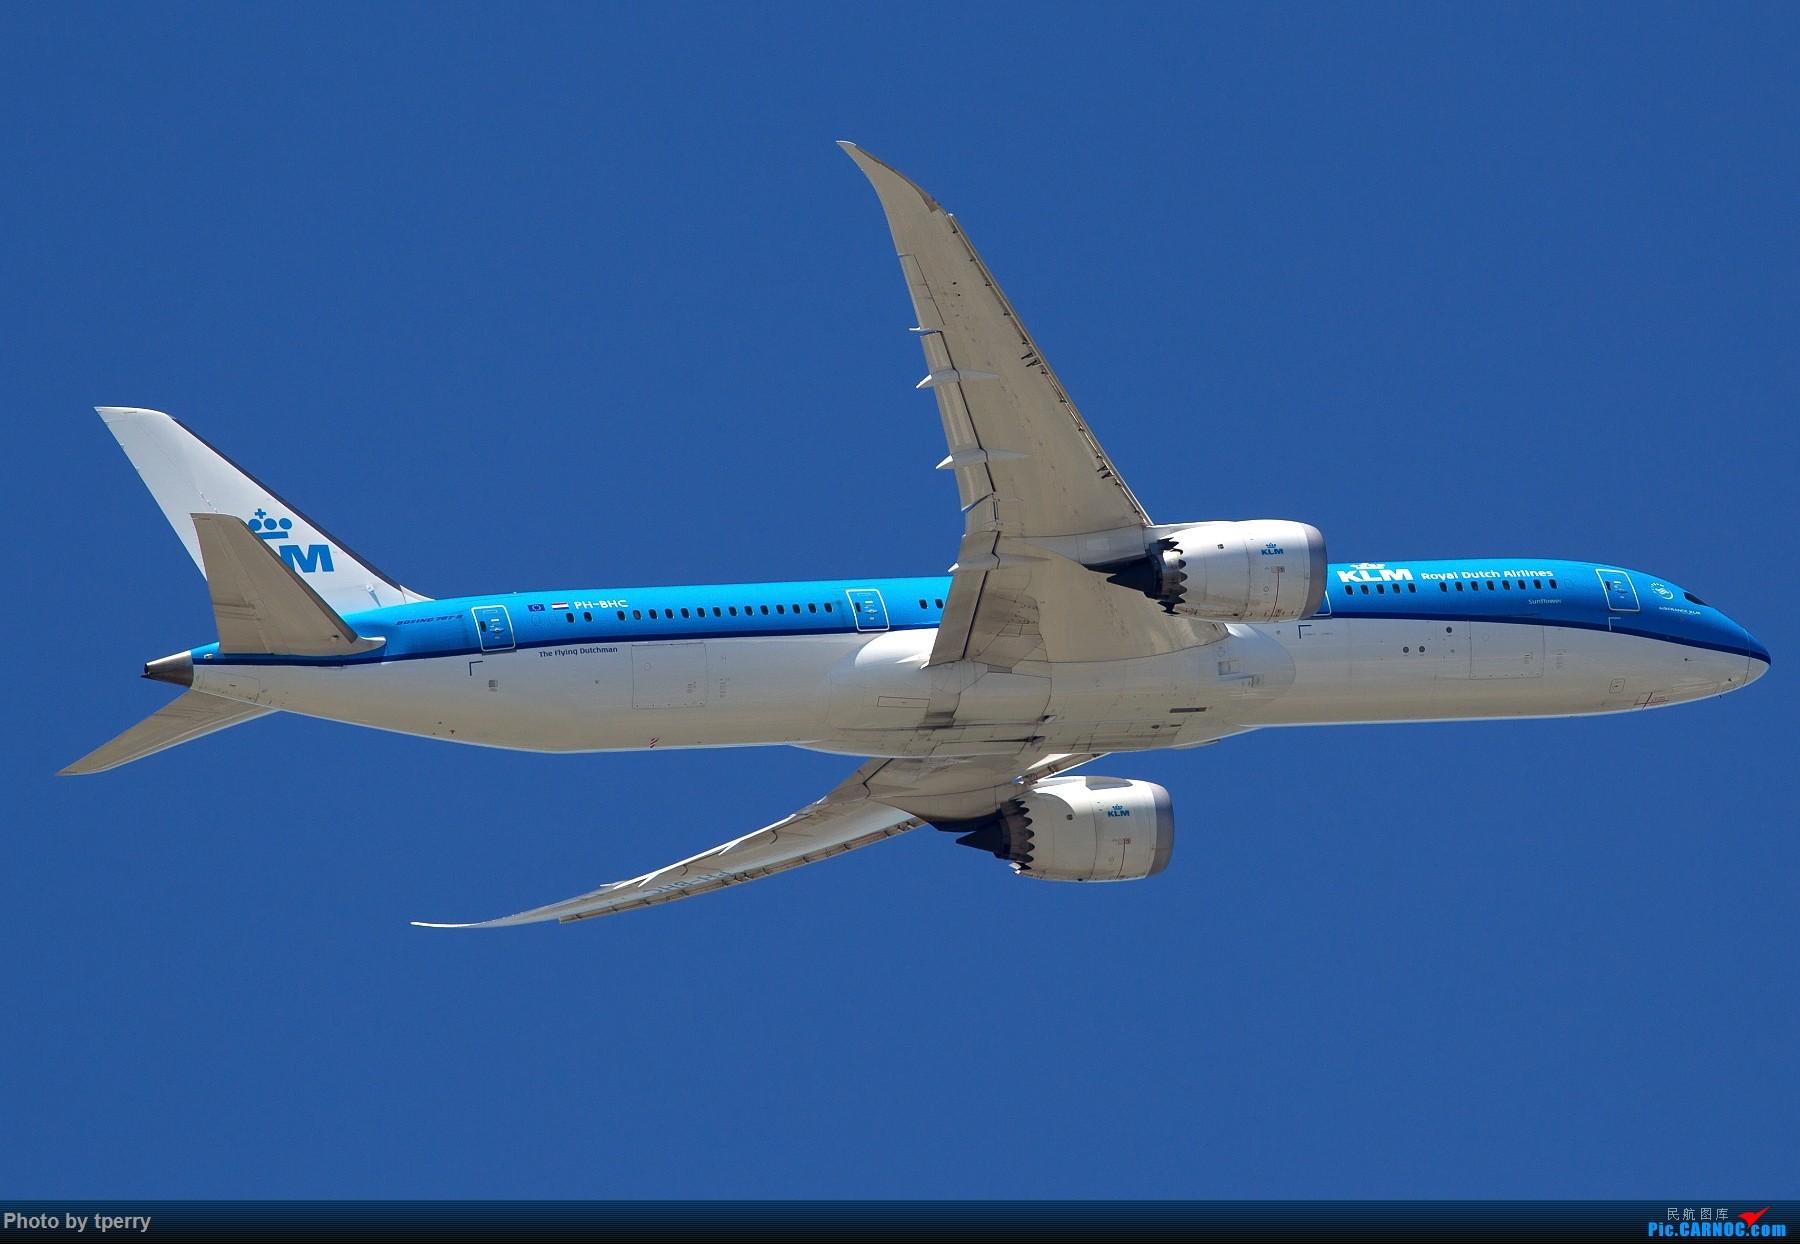 Re:[原创]【1800大图】蓝天来好货的机会可真不多 关键词:汉莎拜仁 米老鼠 达美天合 AIRBUS A350-900 PH-BHC 中国北京首都国际机场